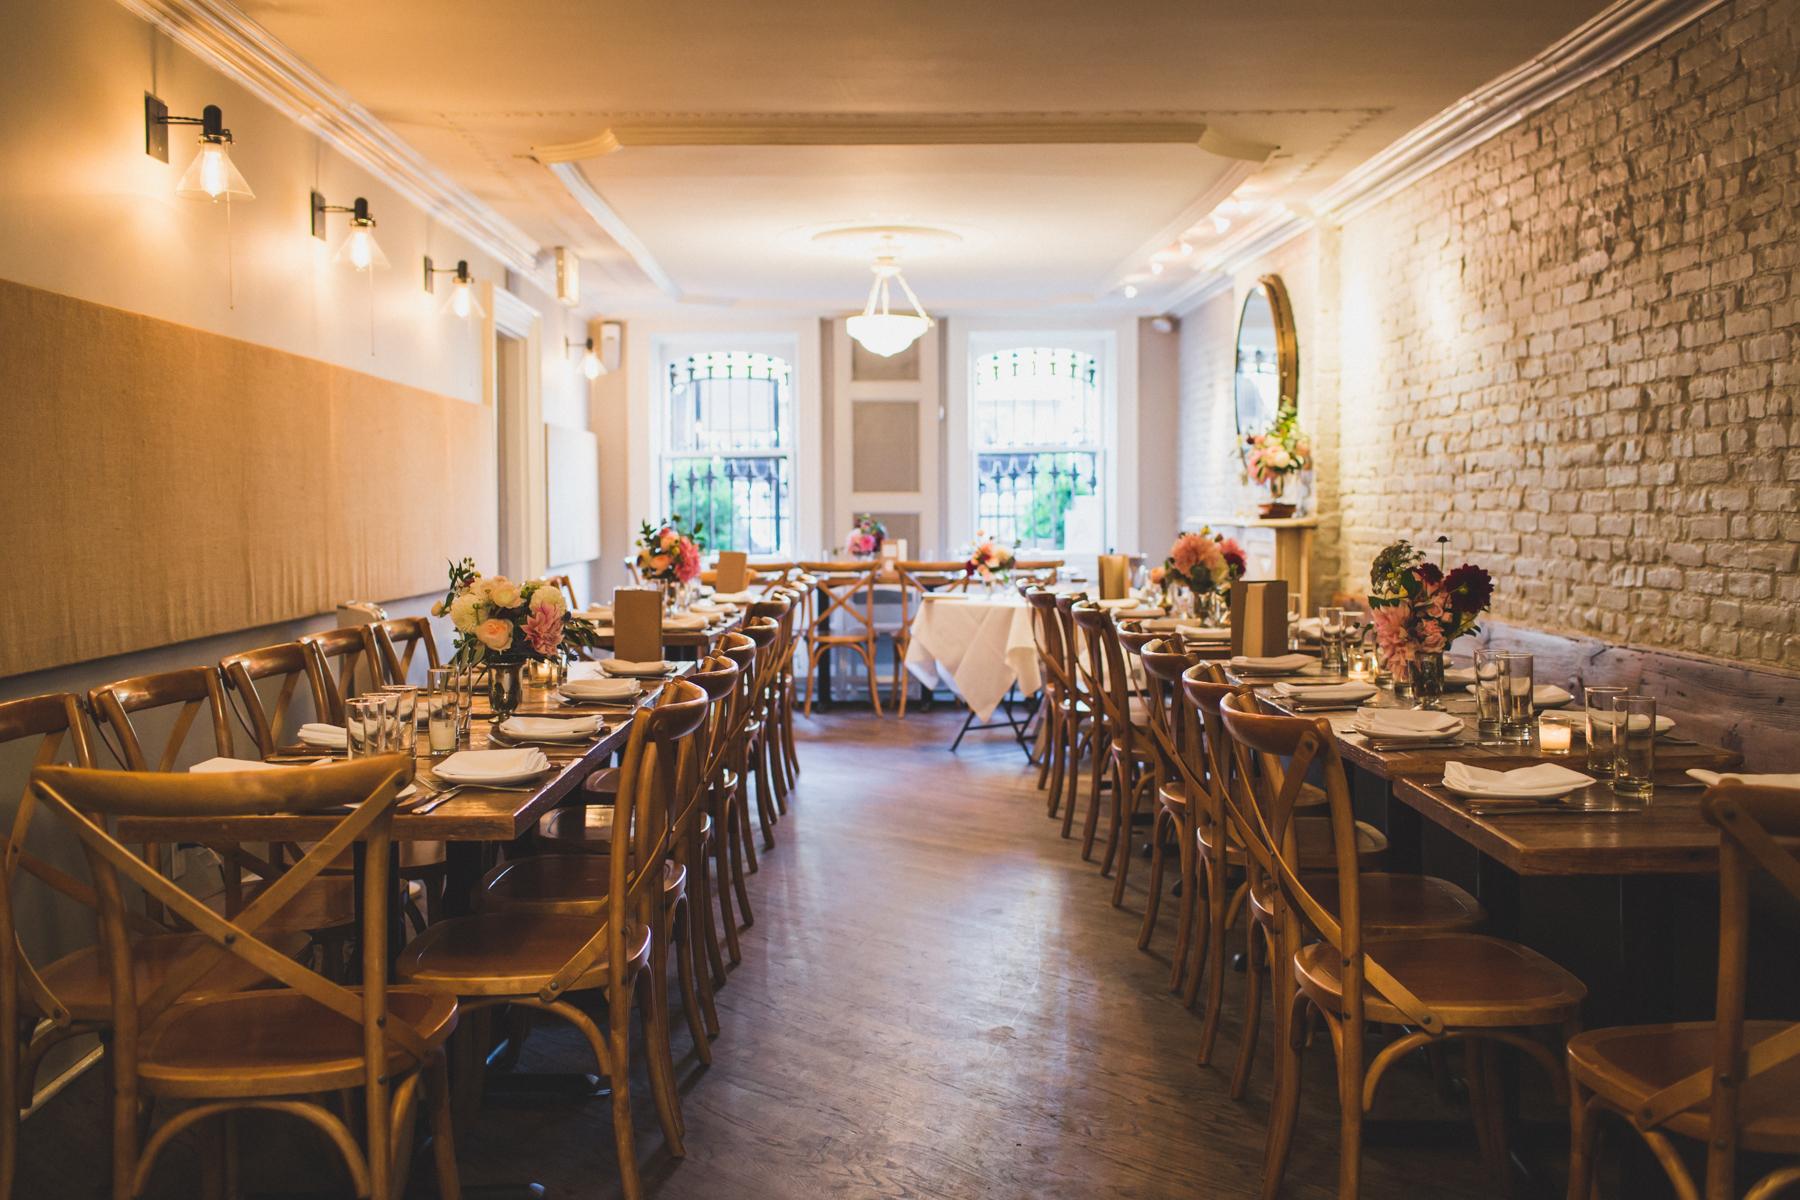 ICI-Restaurant-Fort-Greene-Brooklyn-Intimate-Documentary-Wedding-Photography-Elvira-Kalviste-48.jpg